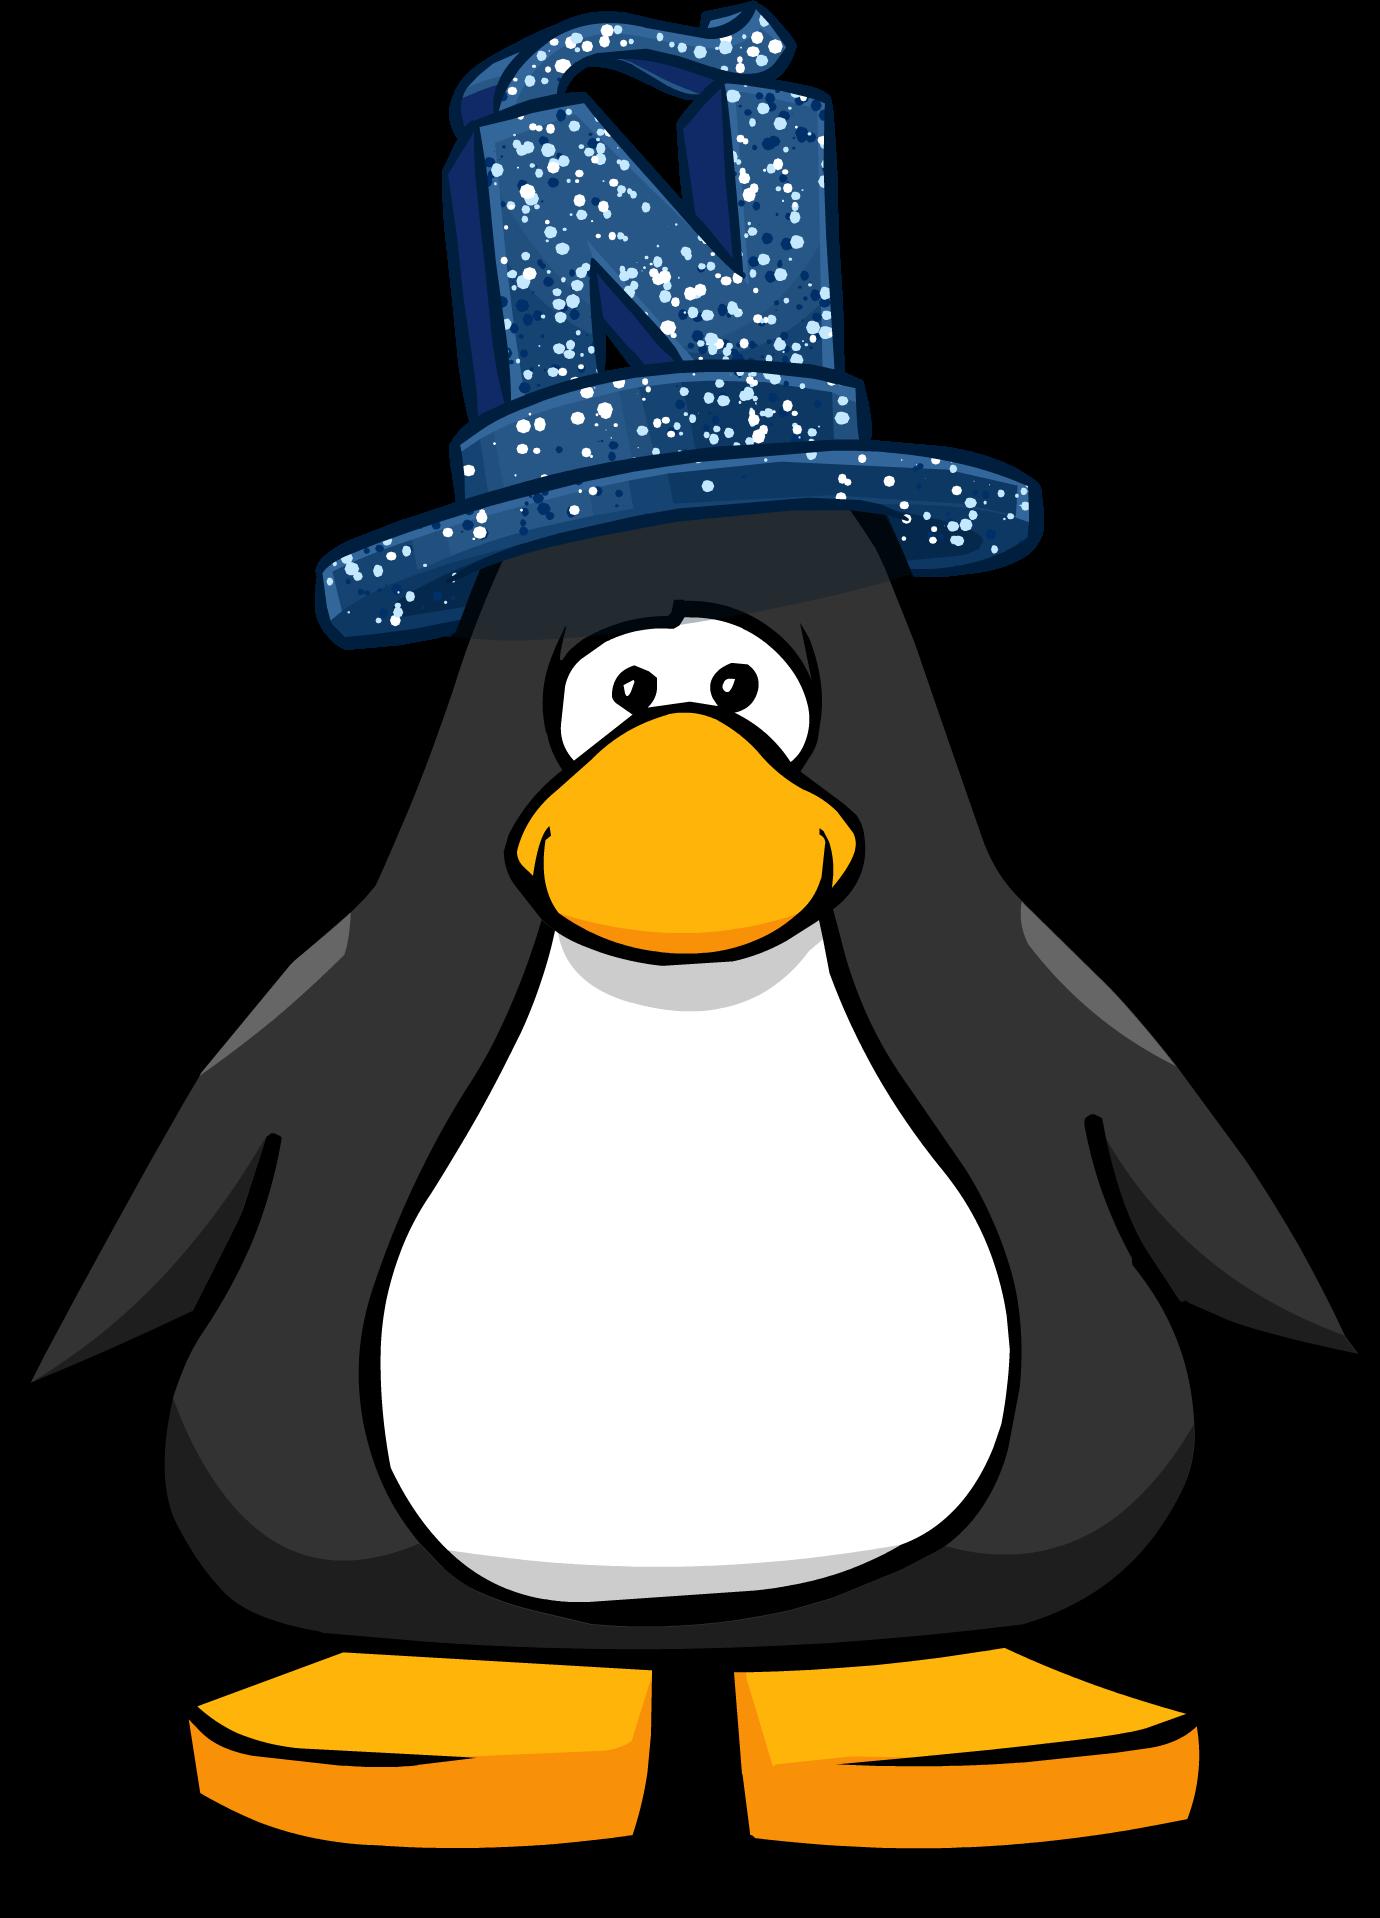 Spanish Fifth Year Hat